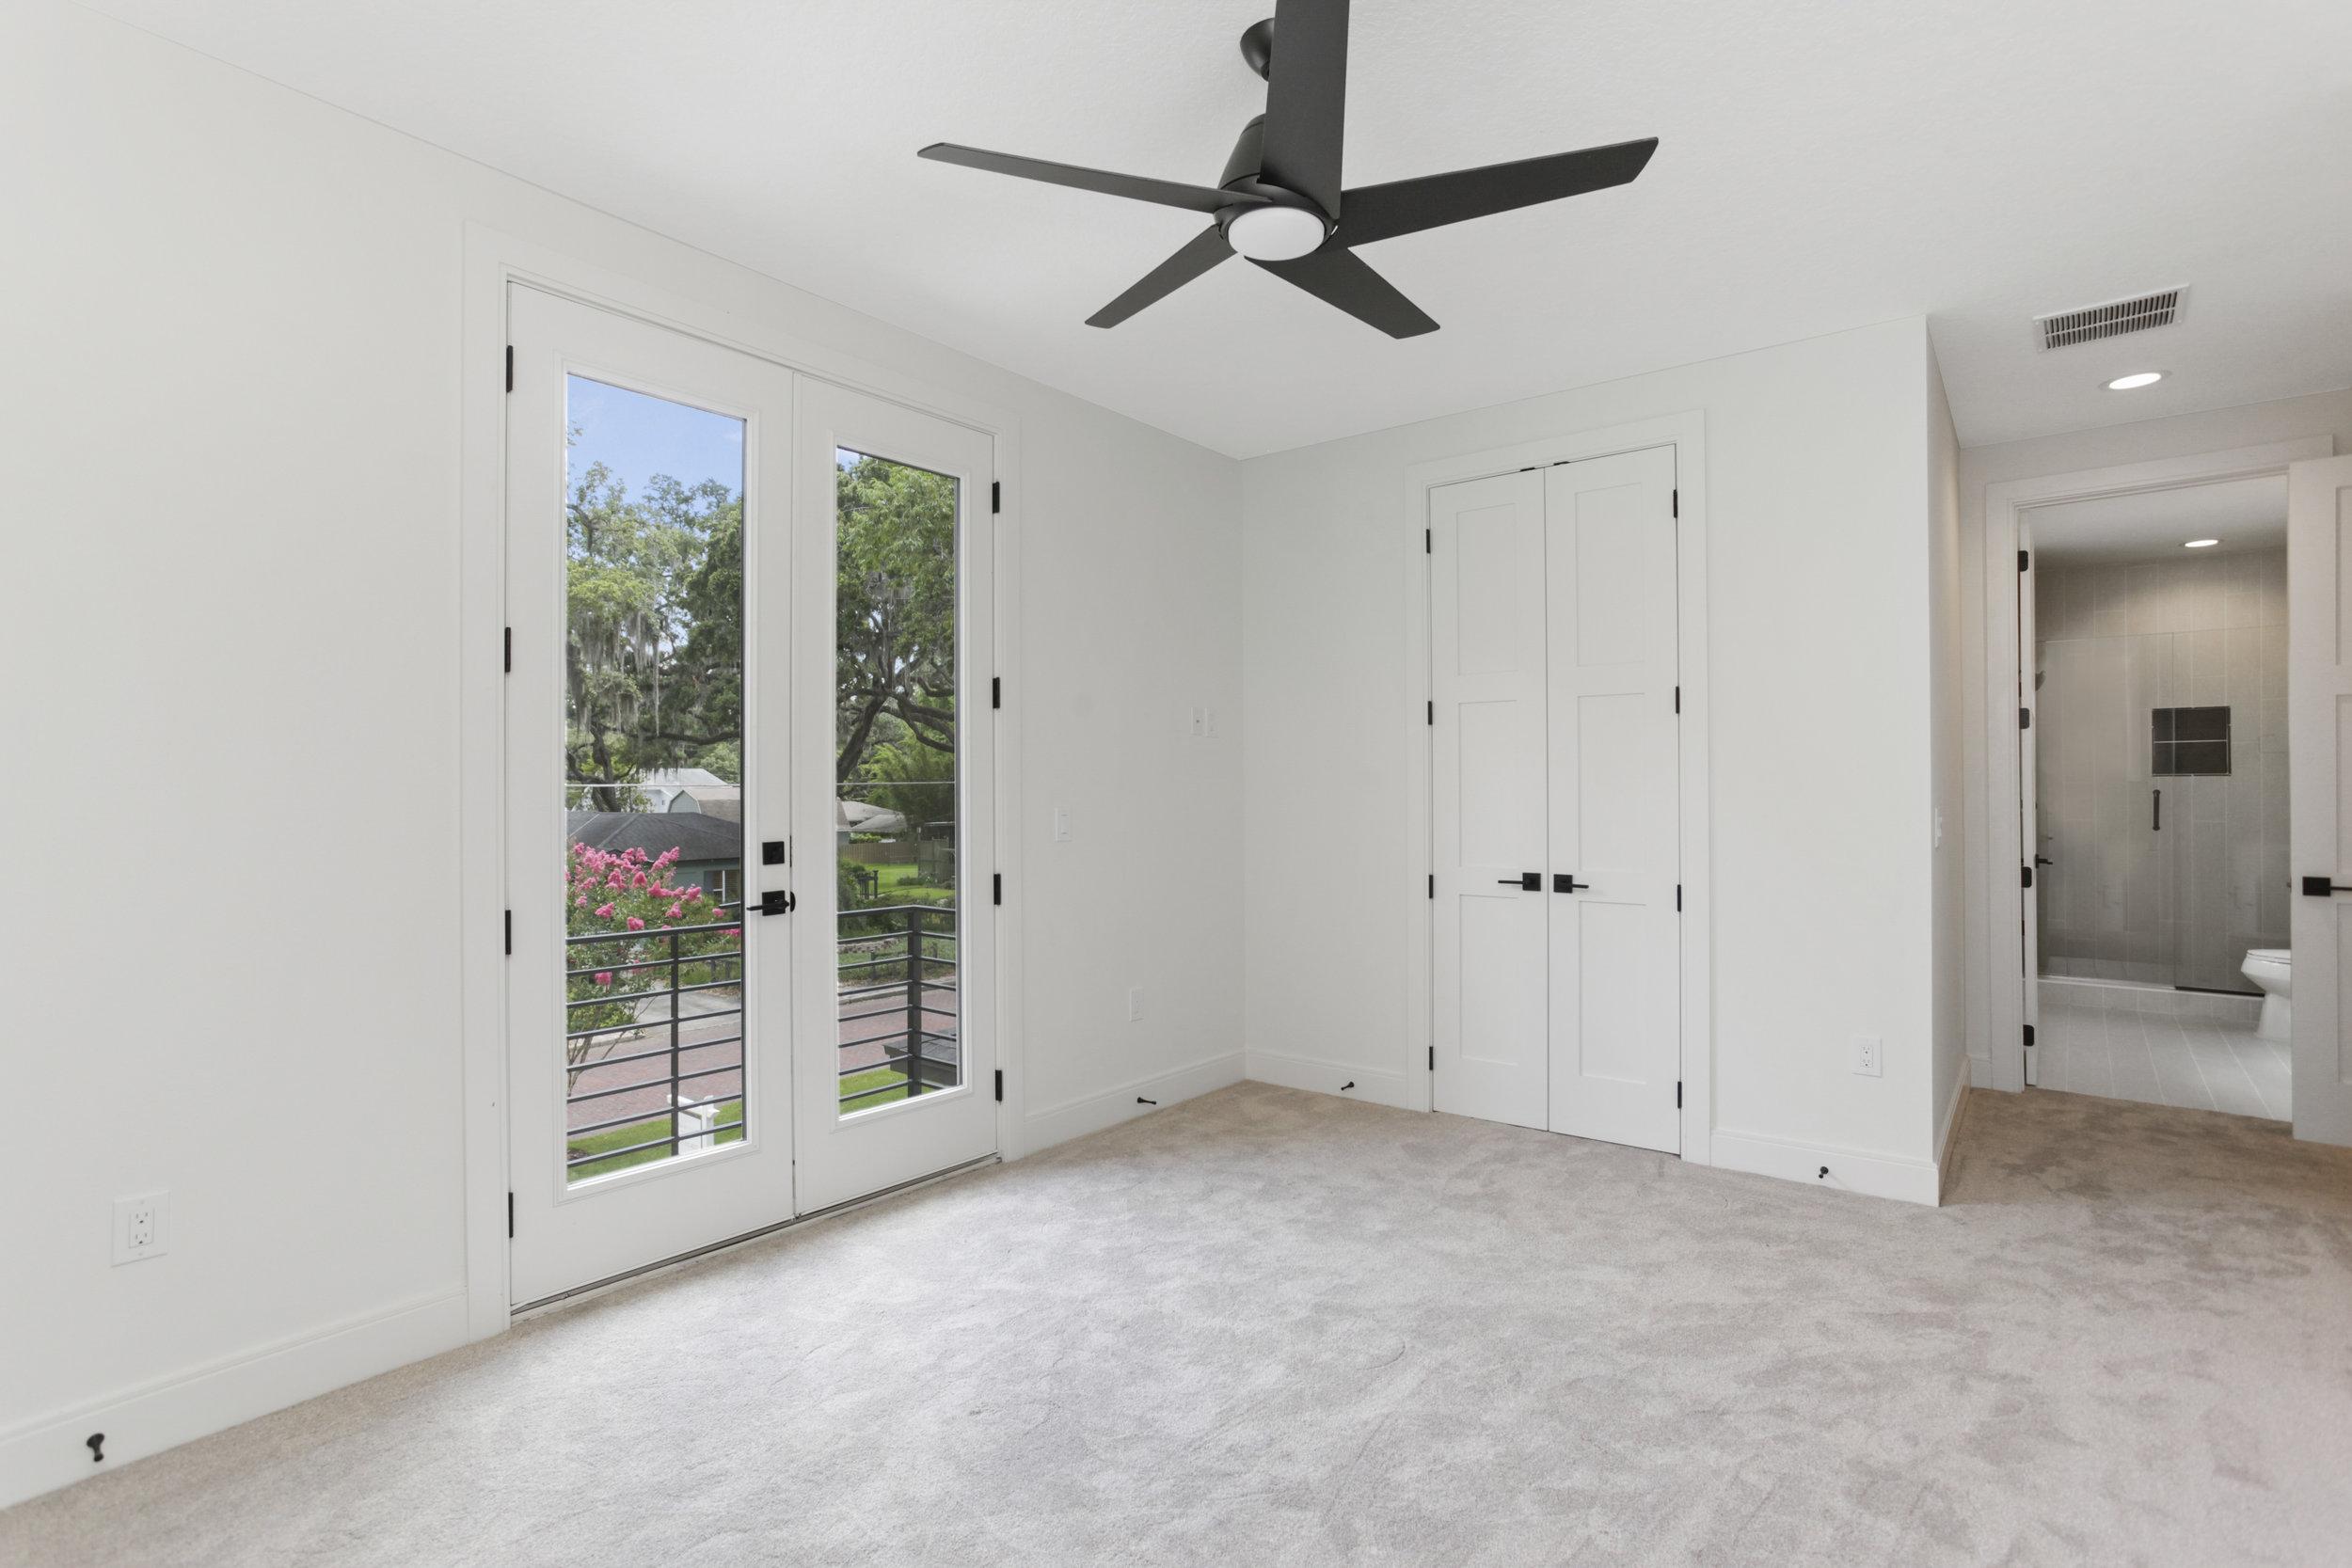 1008 Greenwood St, Orlando_IMG_5284.jpg